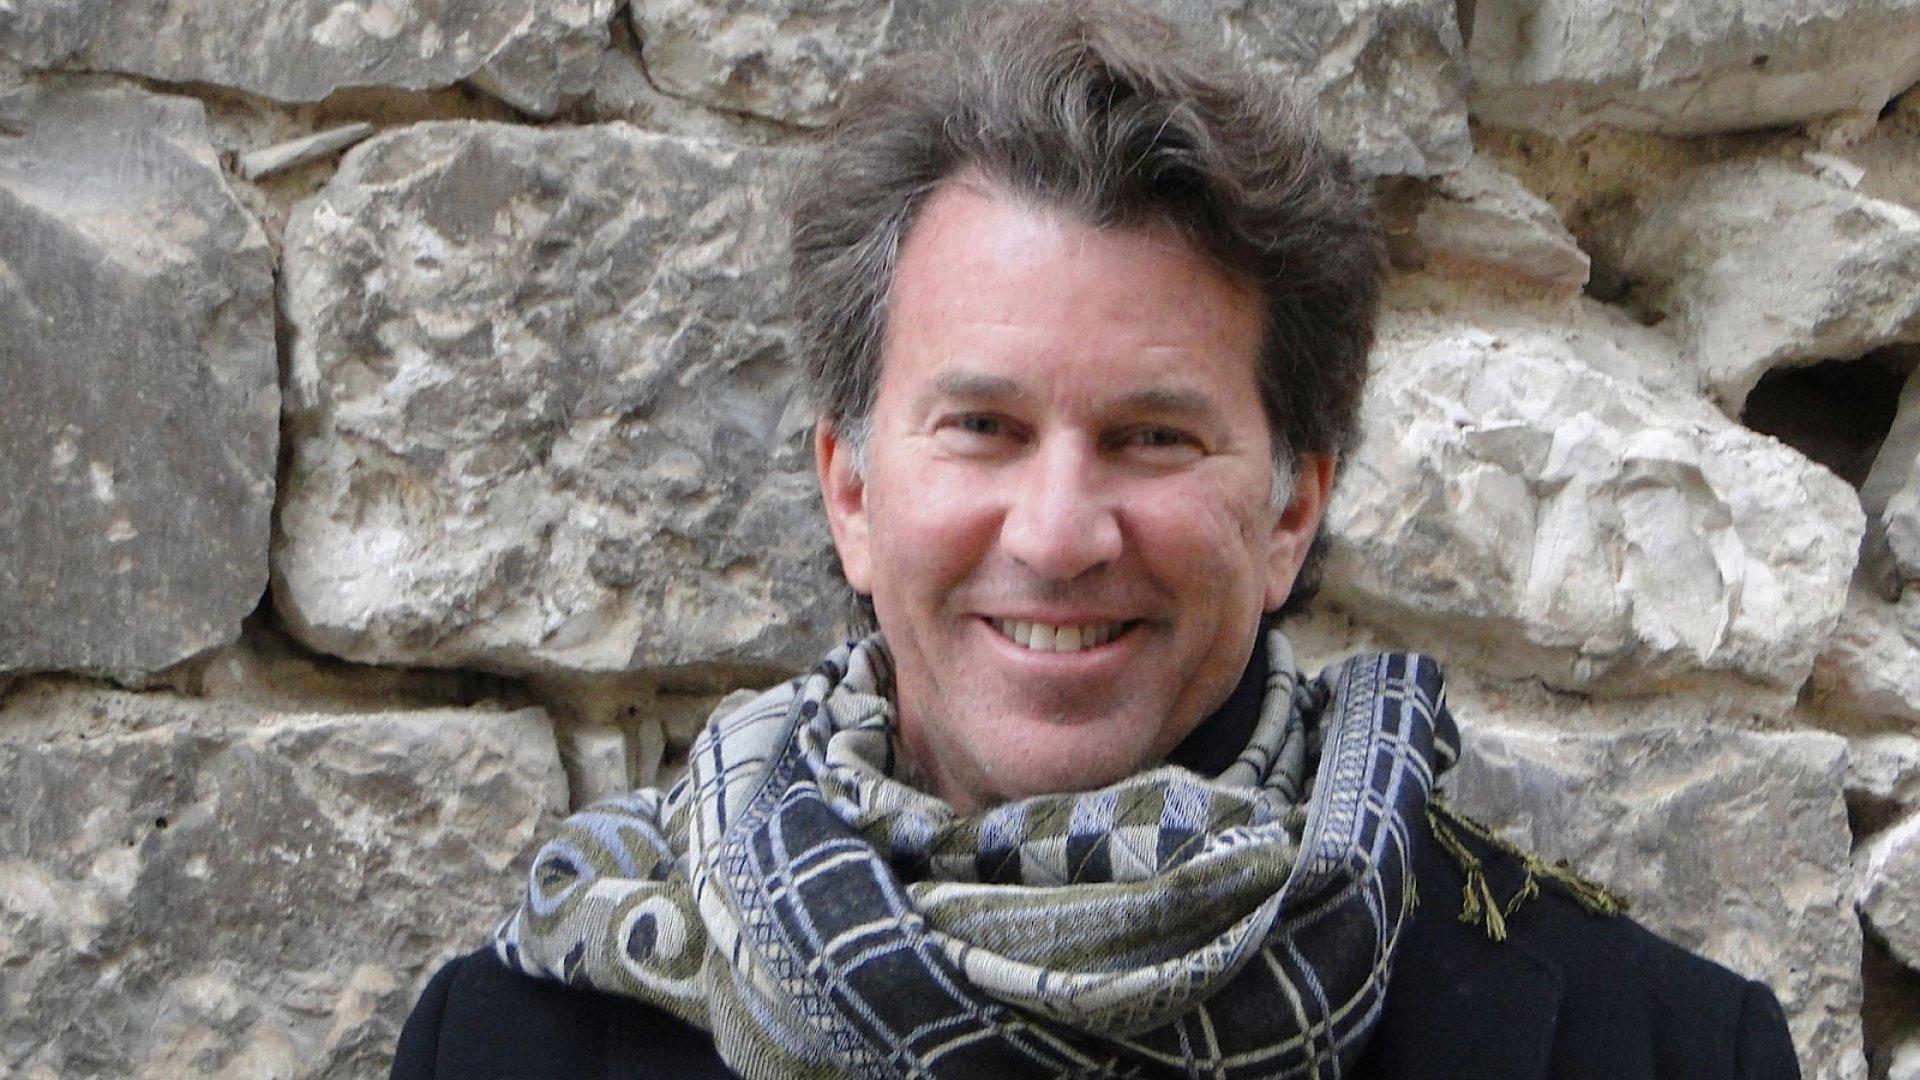 Jeffrey Hollender, entrepreneur, author, CEO, seventh generation inc., leader, headshot